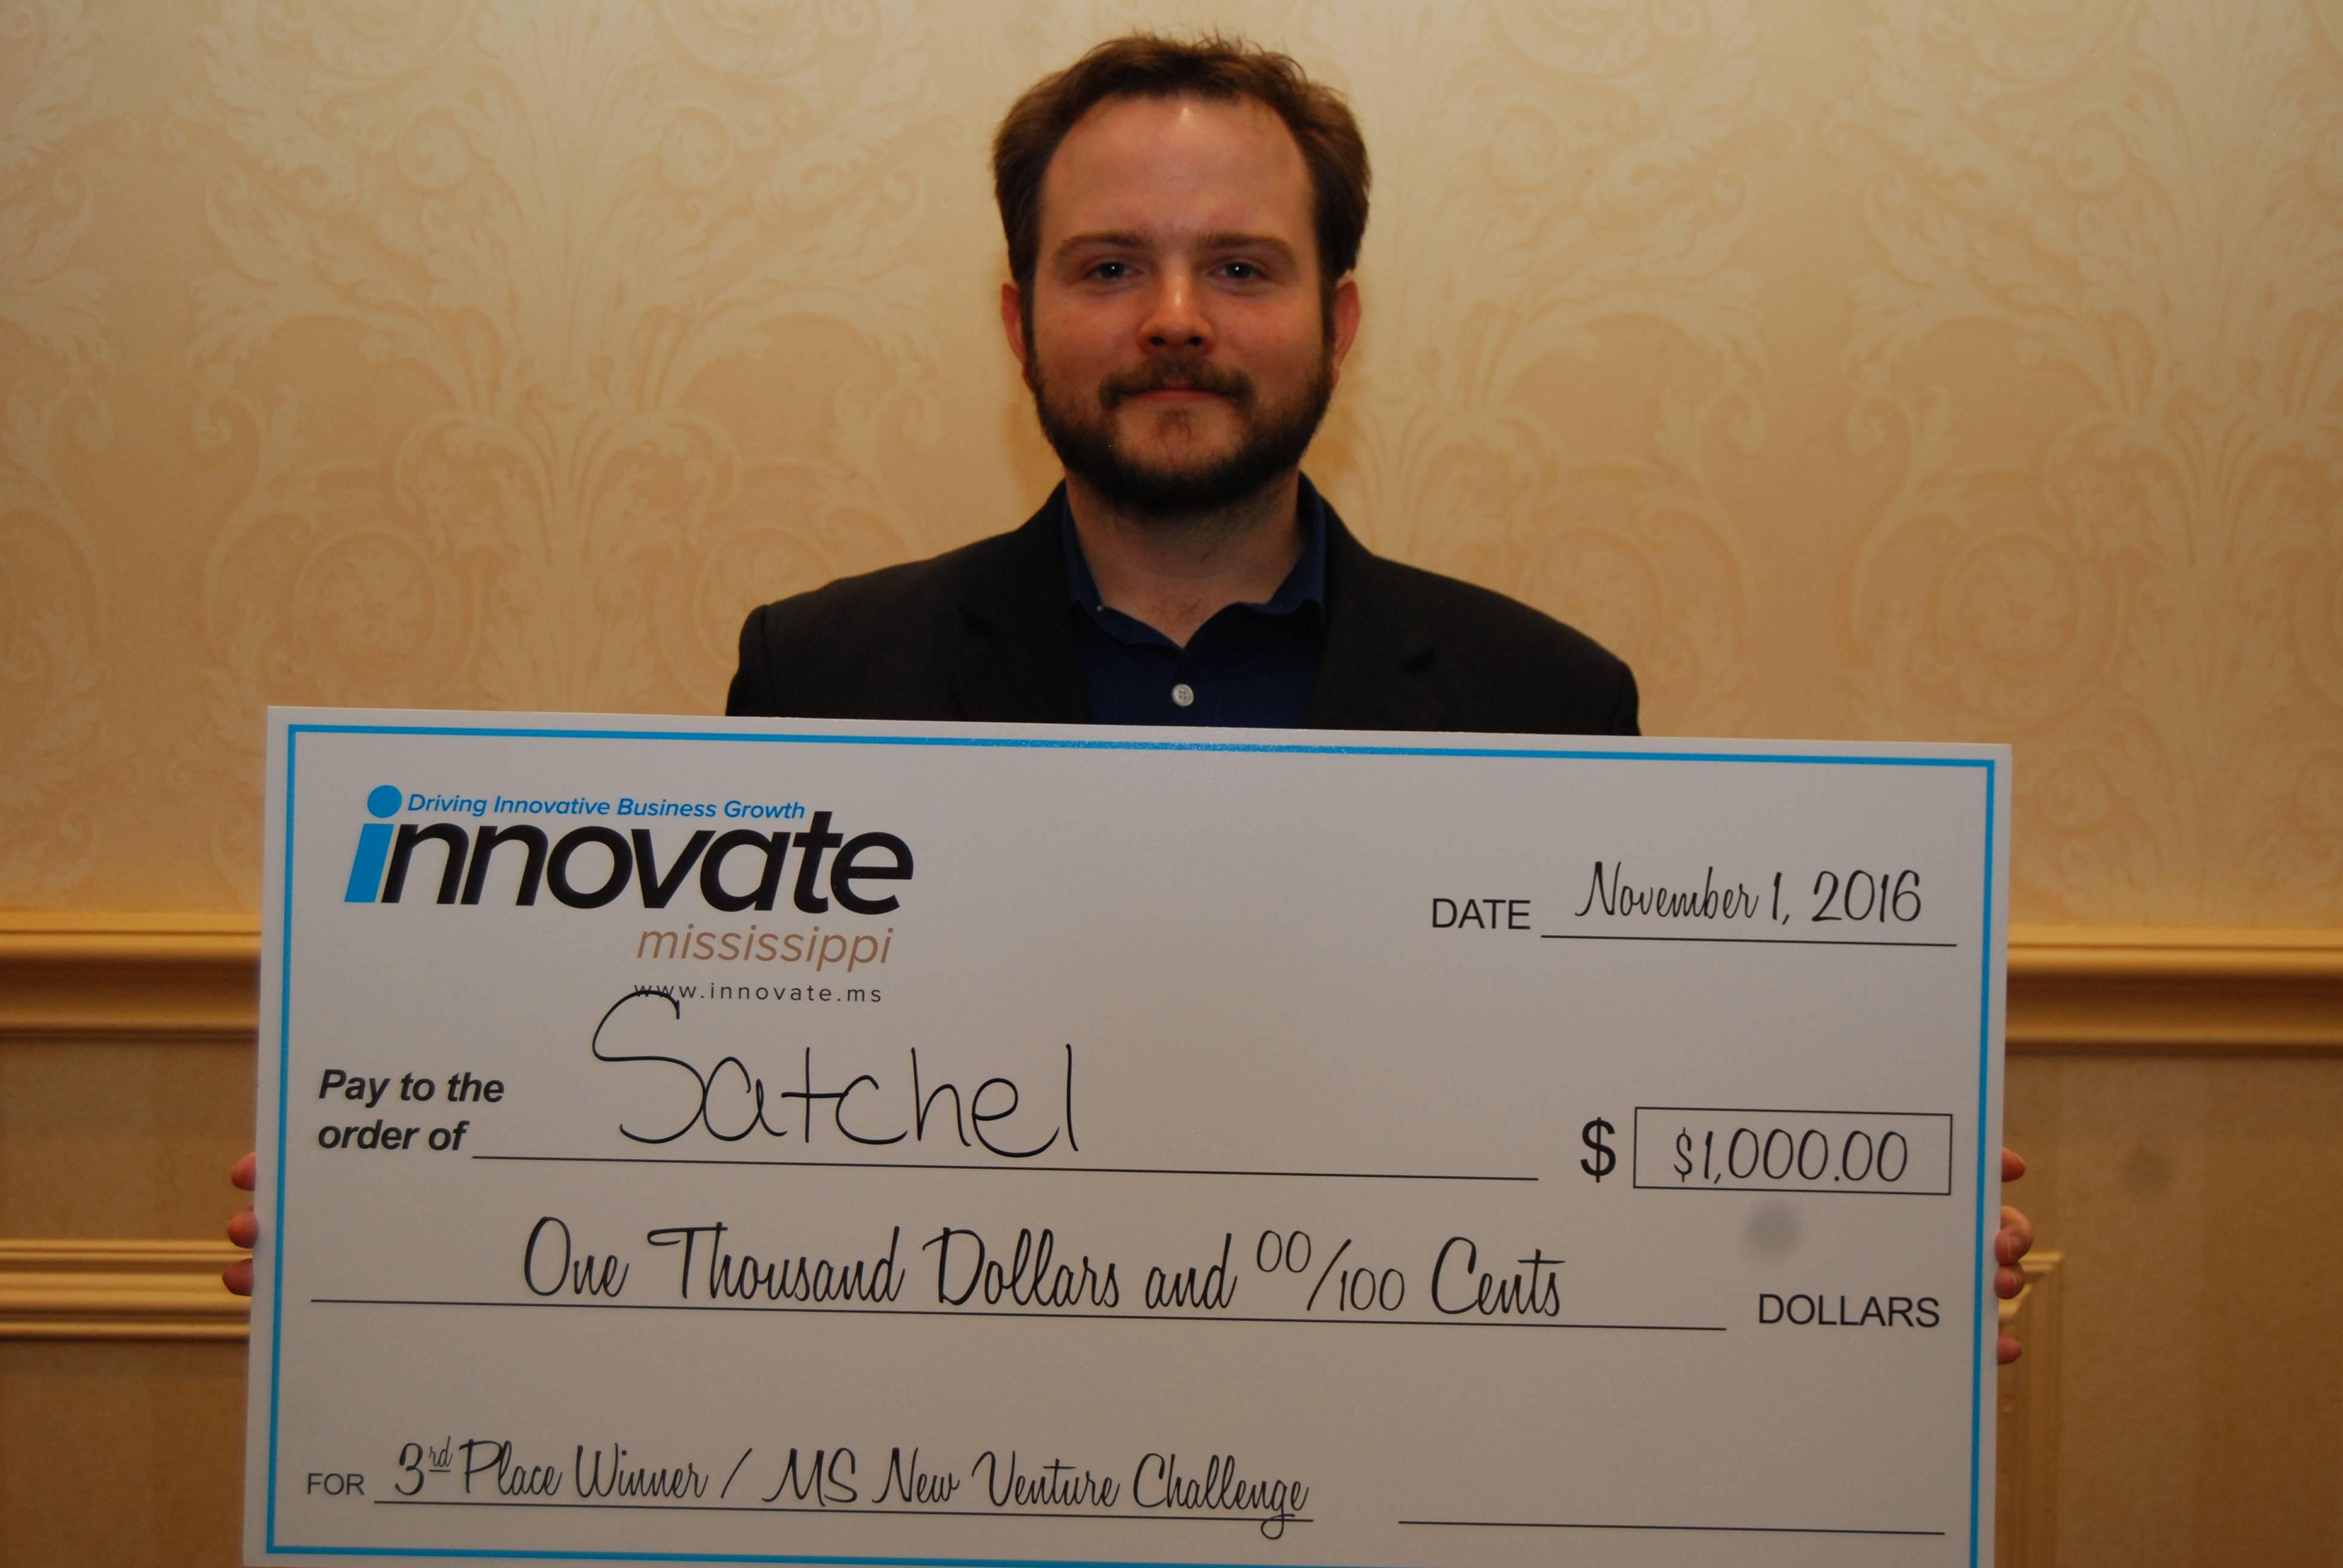 Satchel - Mississippi New Venture Challenge